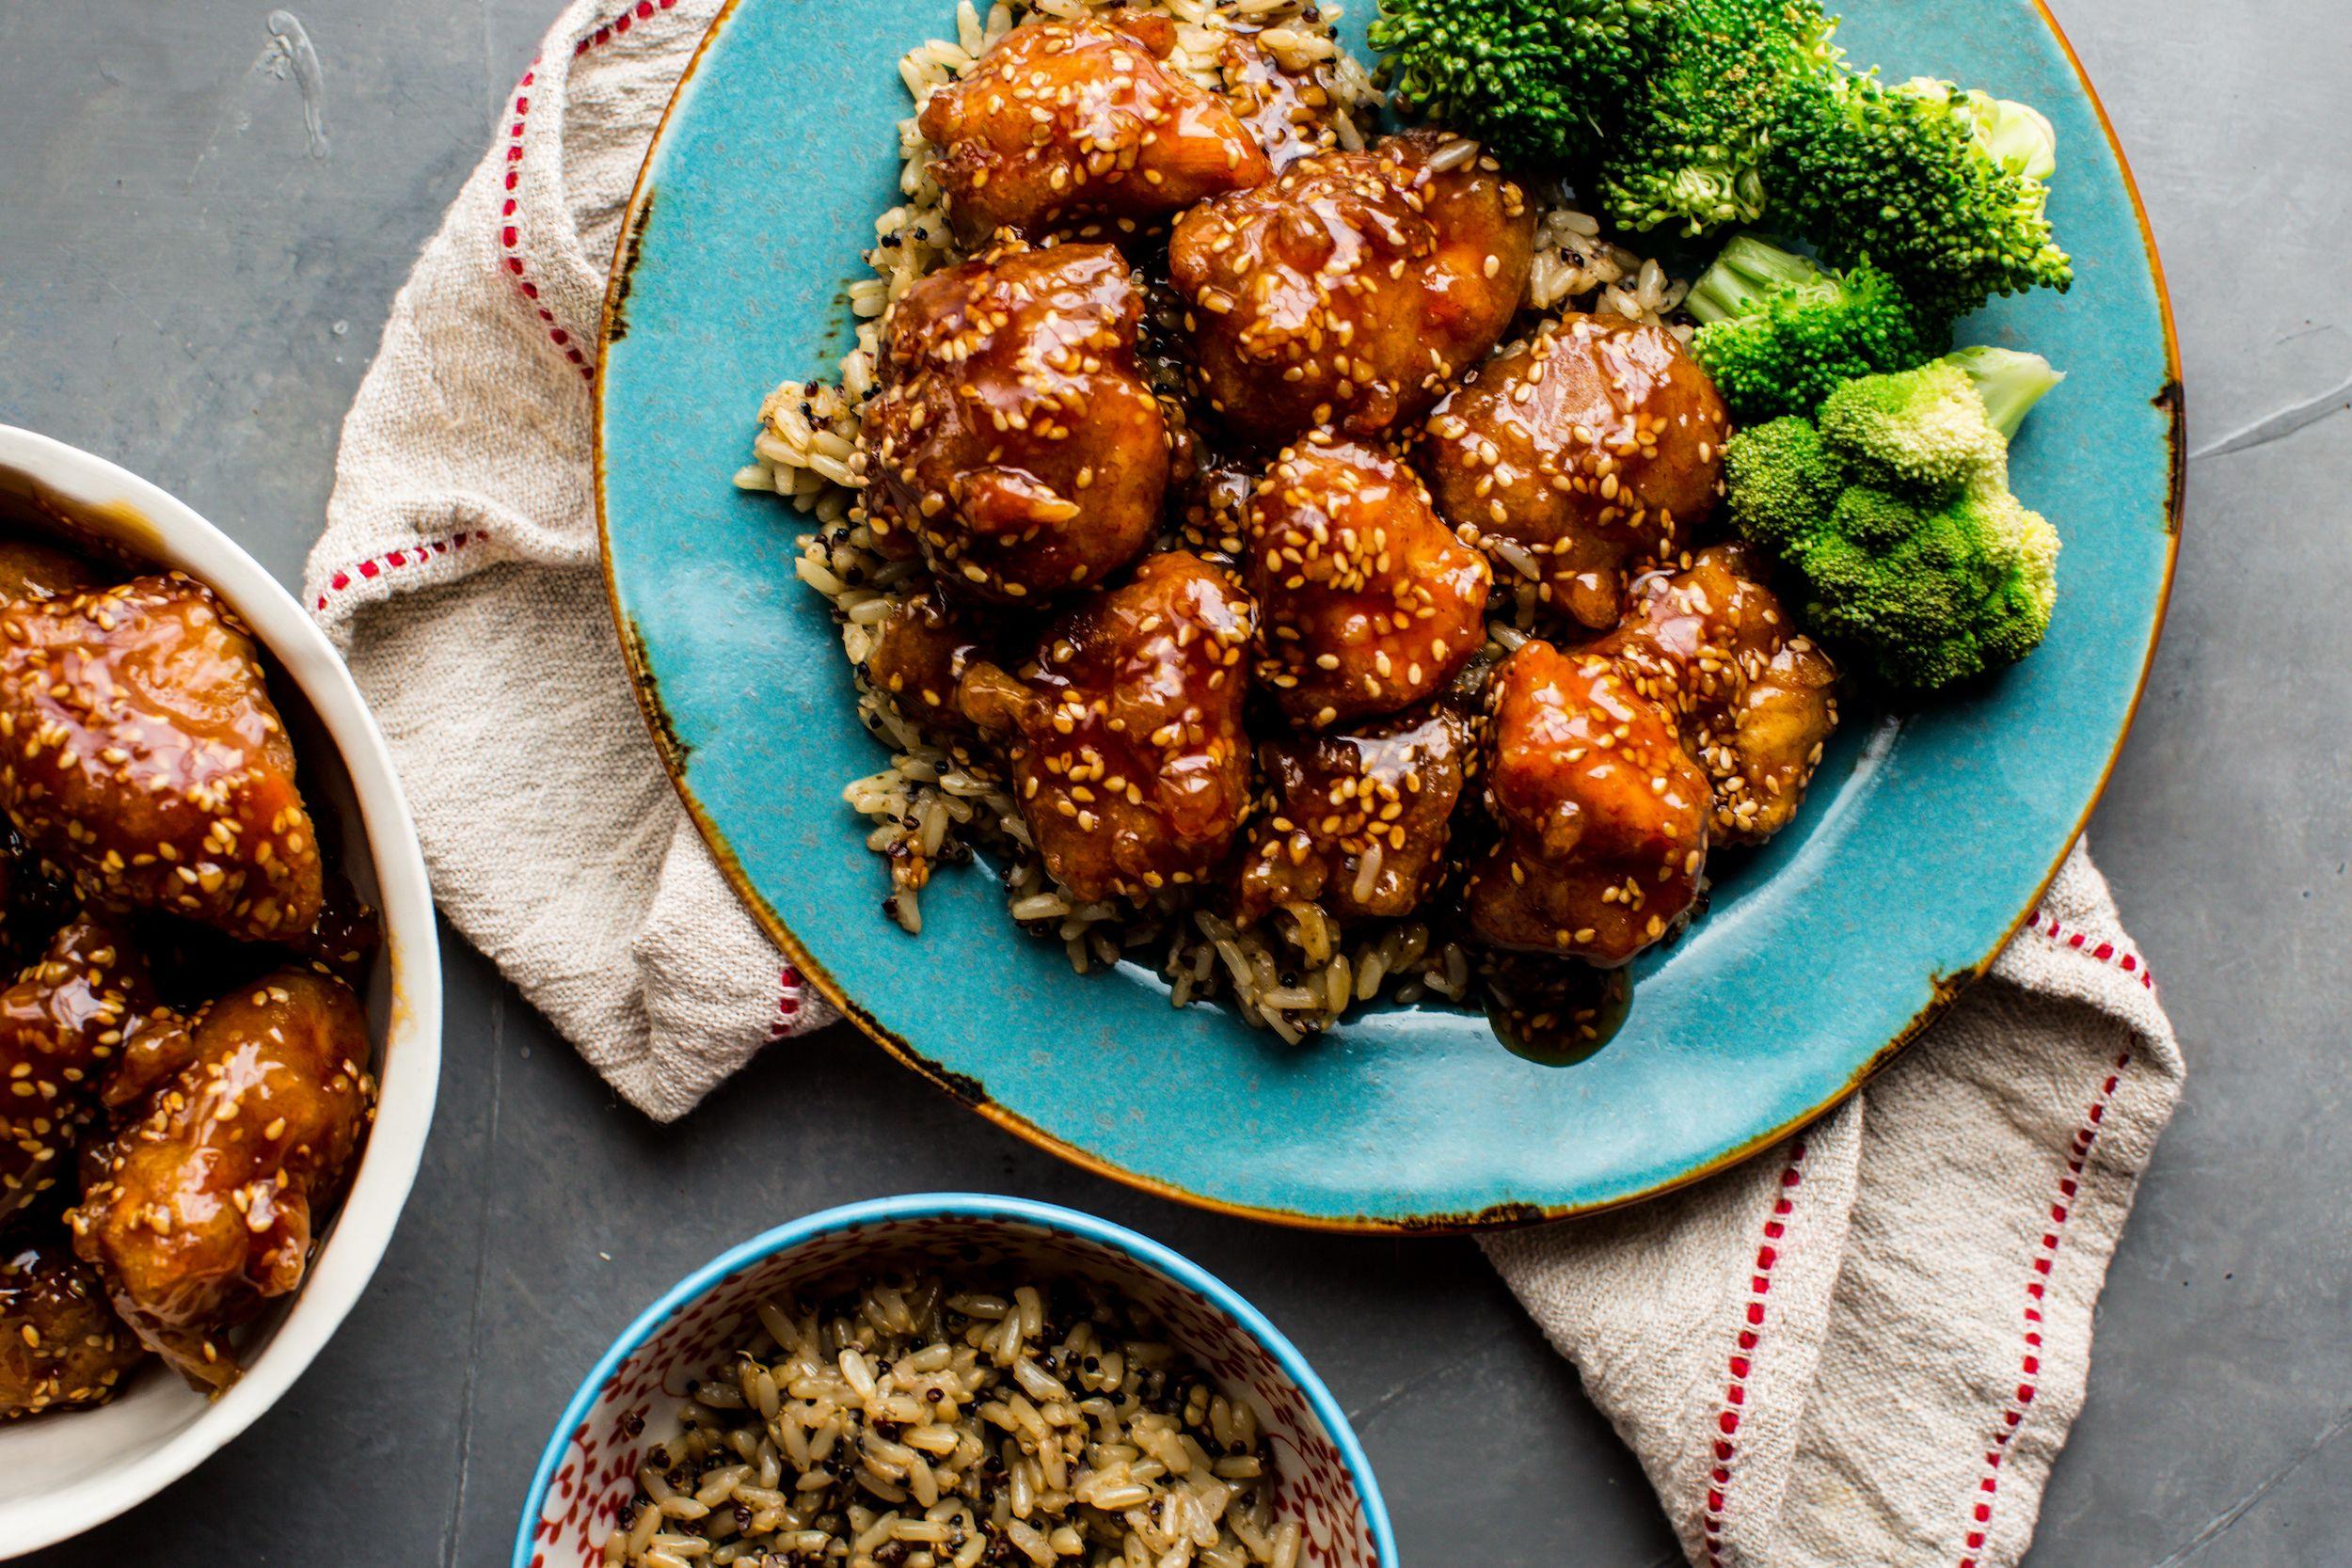 Best Crispy Honey Sesame Chicken Recipe How To Make Crispy Honey Sesame Chicken Delish Com